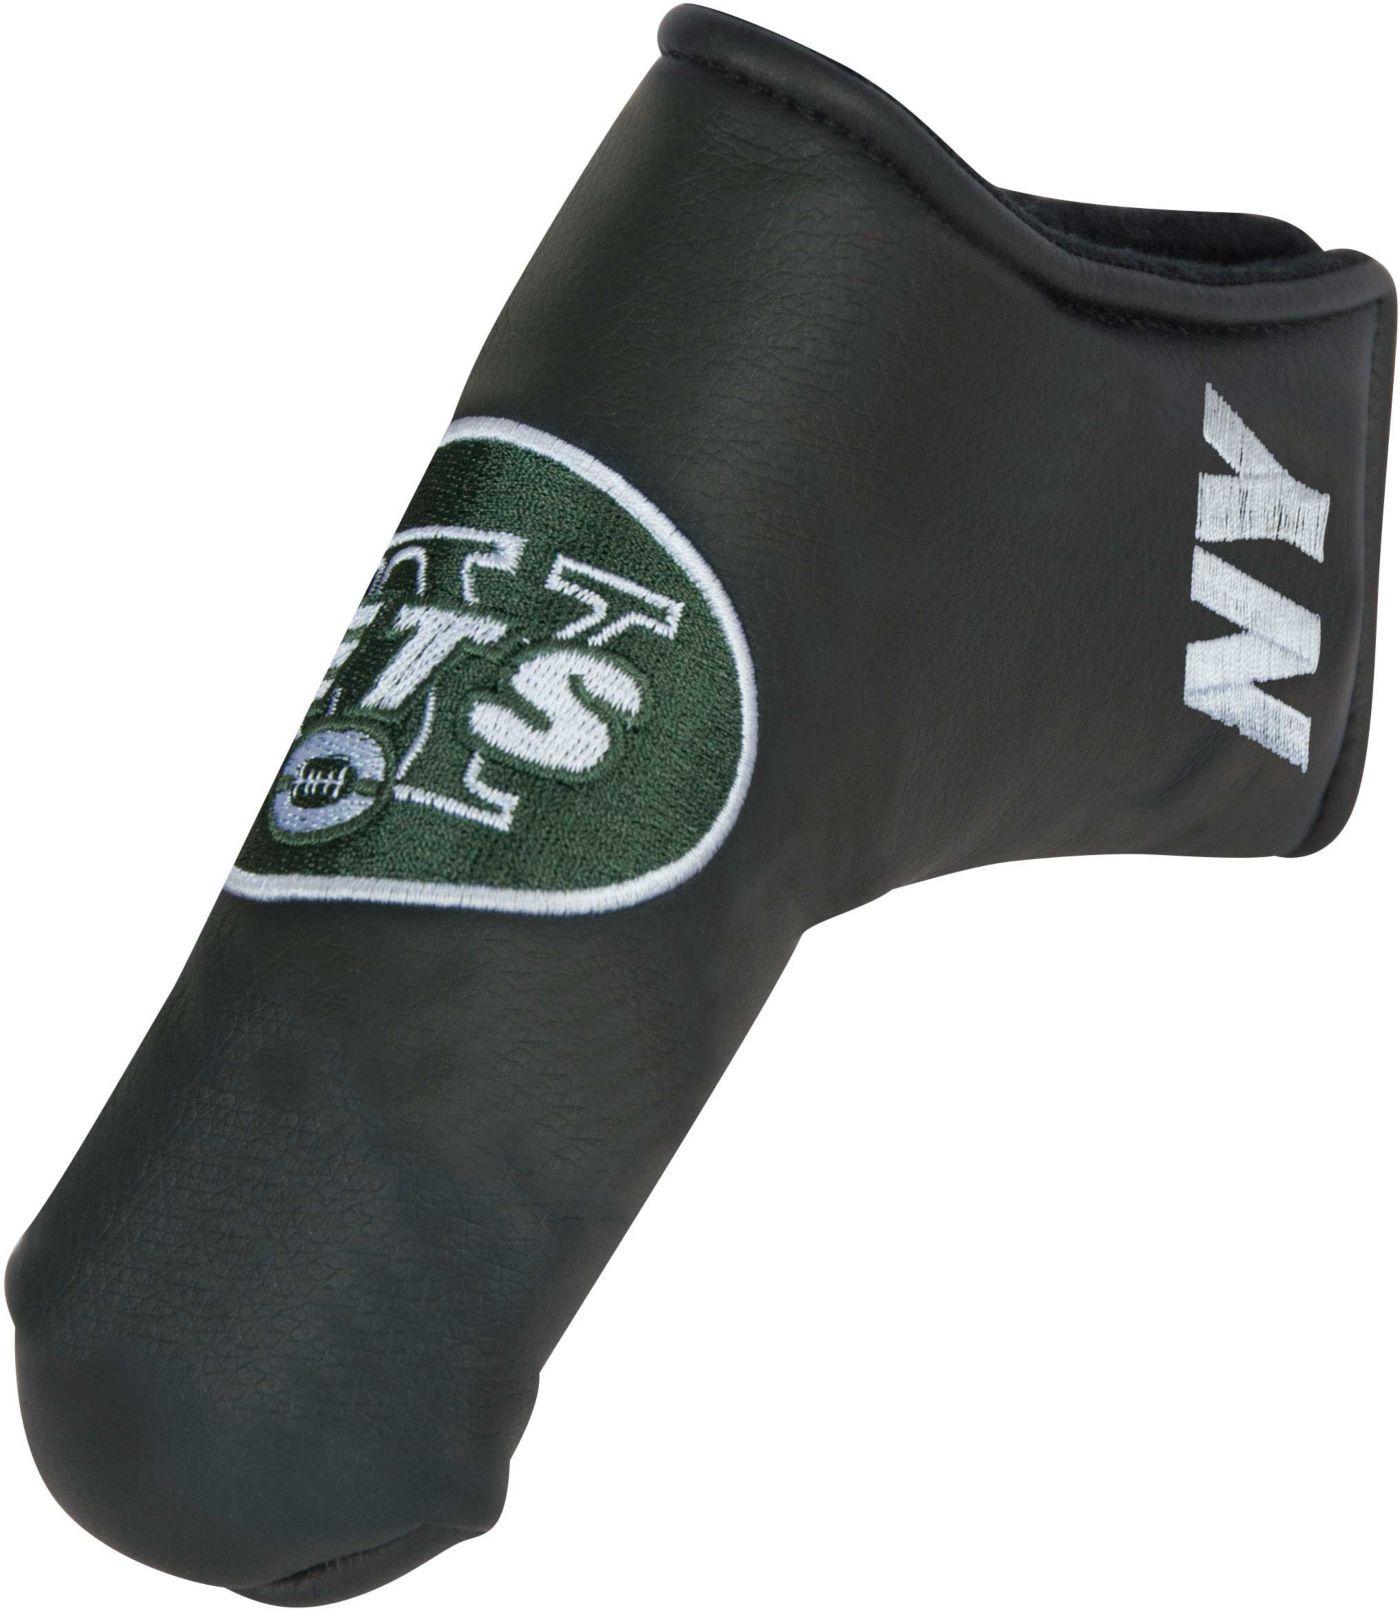 Team Effort New York Jets Blade Putter Headcover